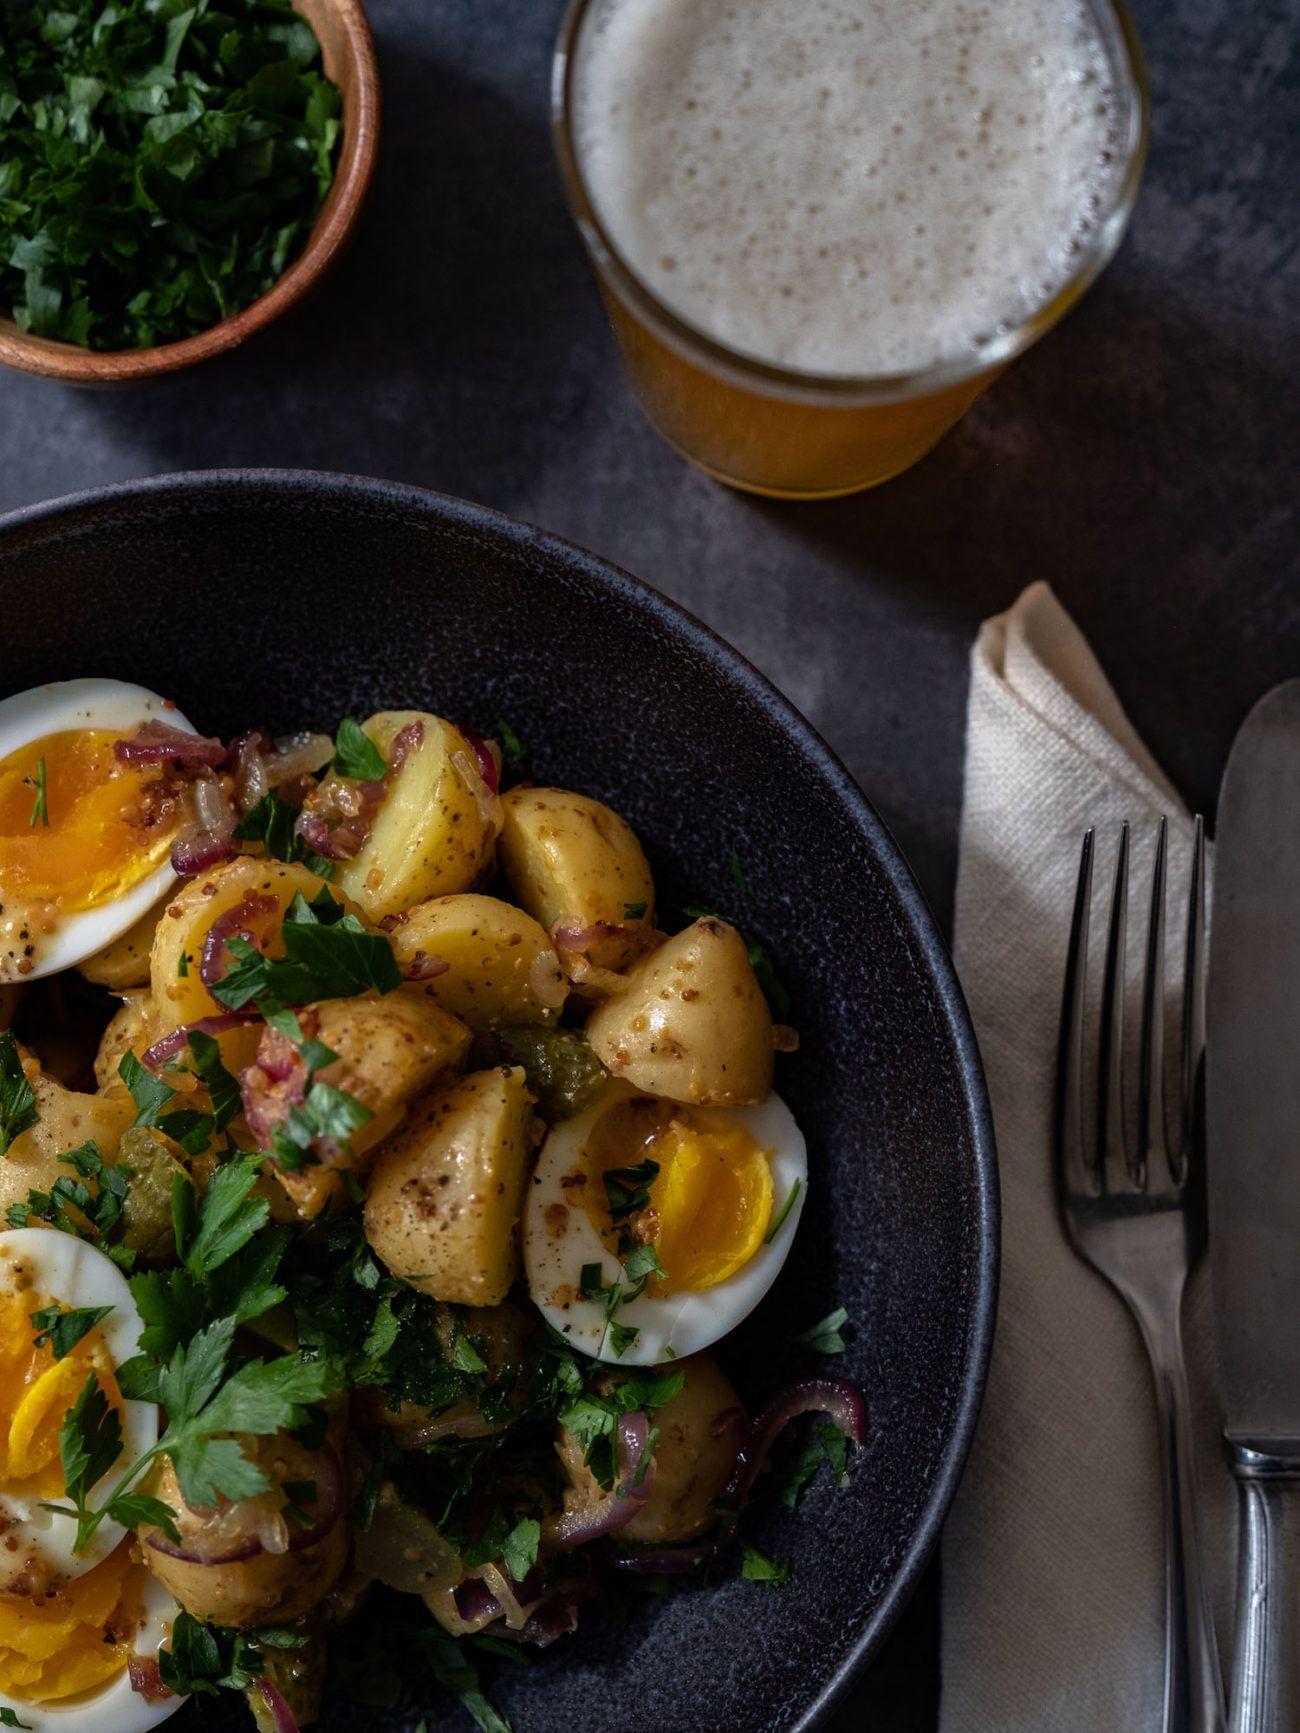 Rezept, Kartoffelsalat mit gekochten Eiern, Senfdressing, Essiggurken, Petersilie, Besteck, Bier, Serviette